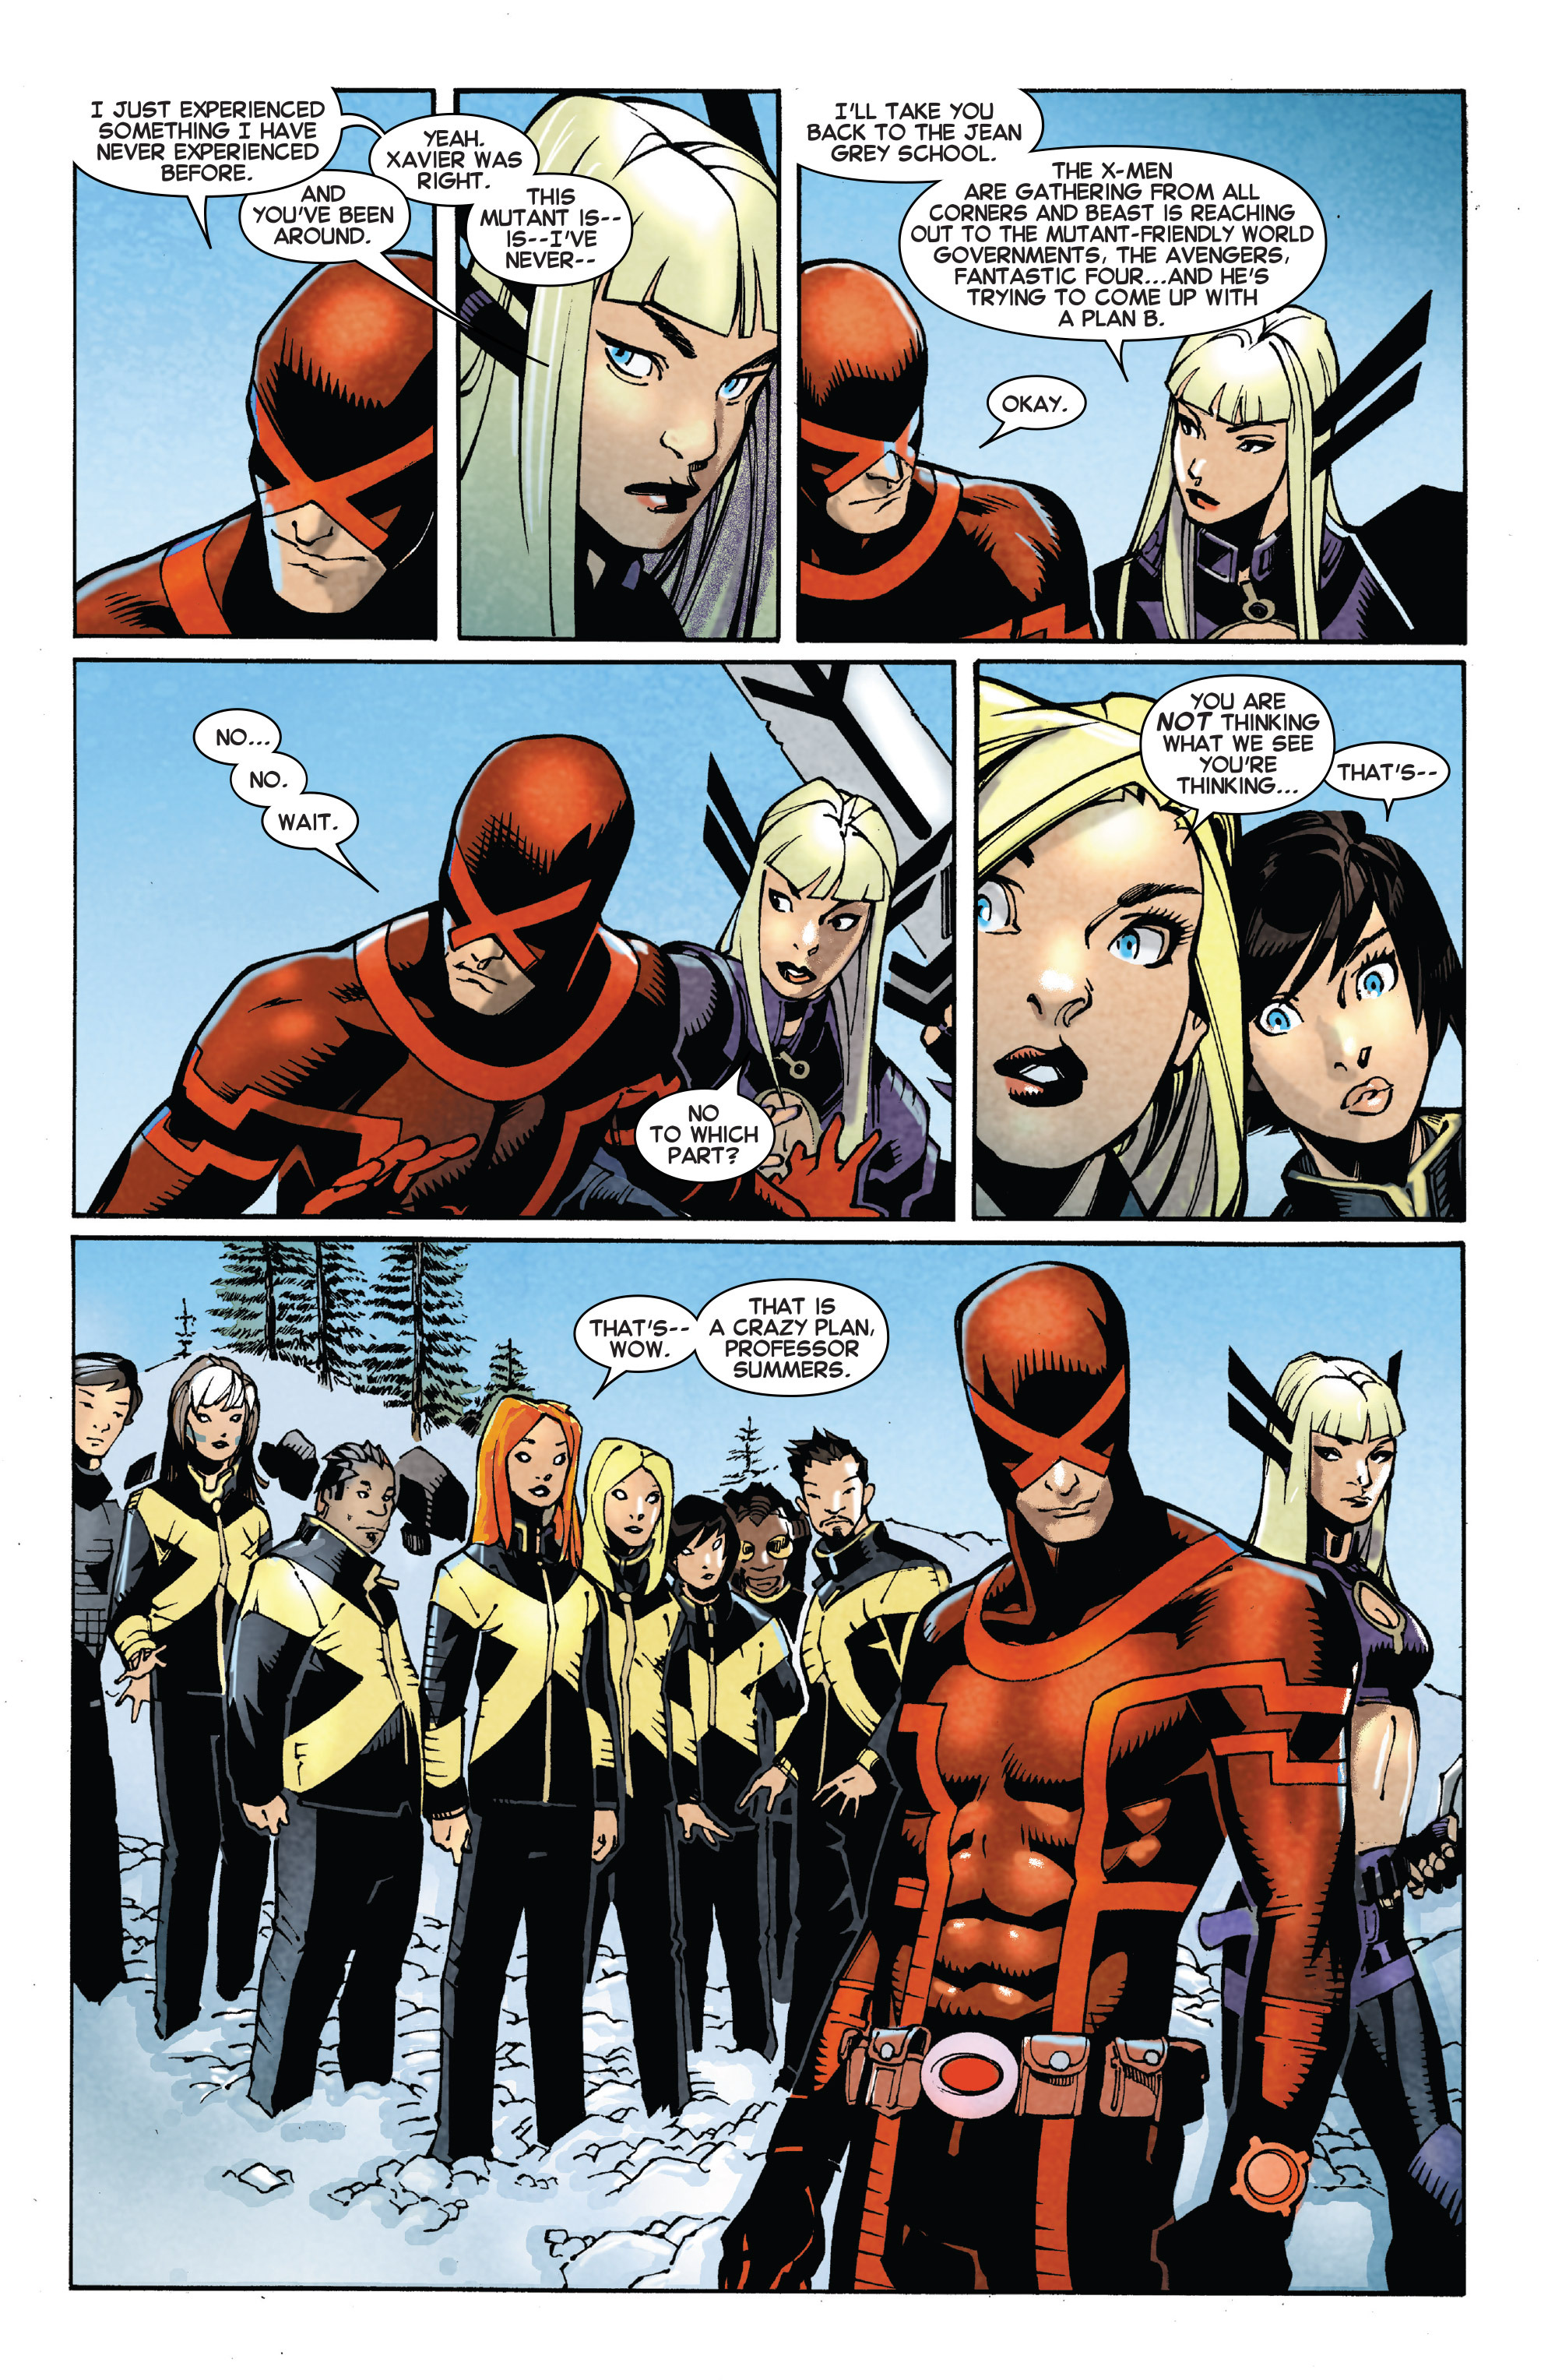 Read online Uncanny X-Men (2013) comic -  Issue # _TPB 5 - The Omega Mutant - 36